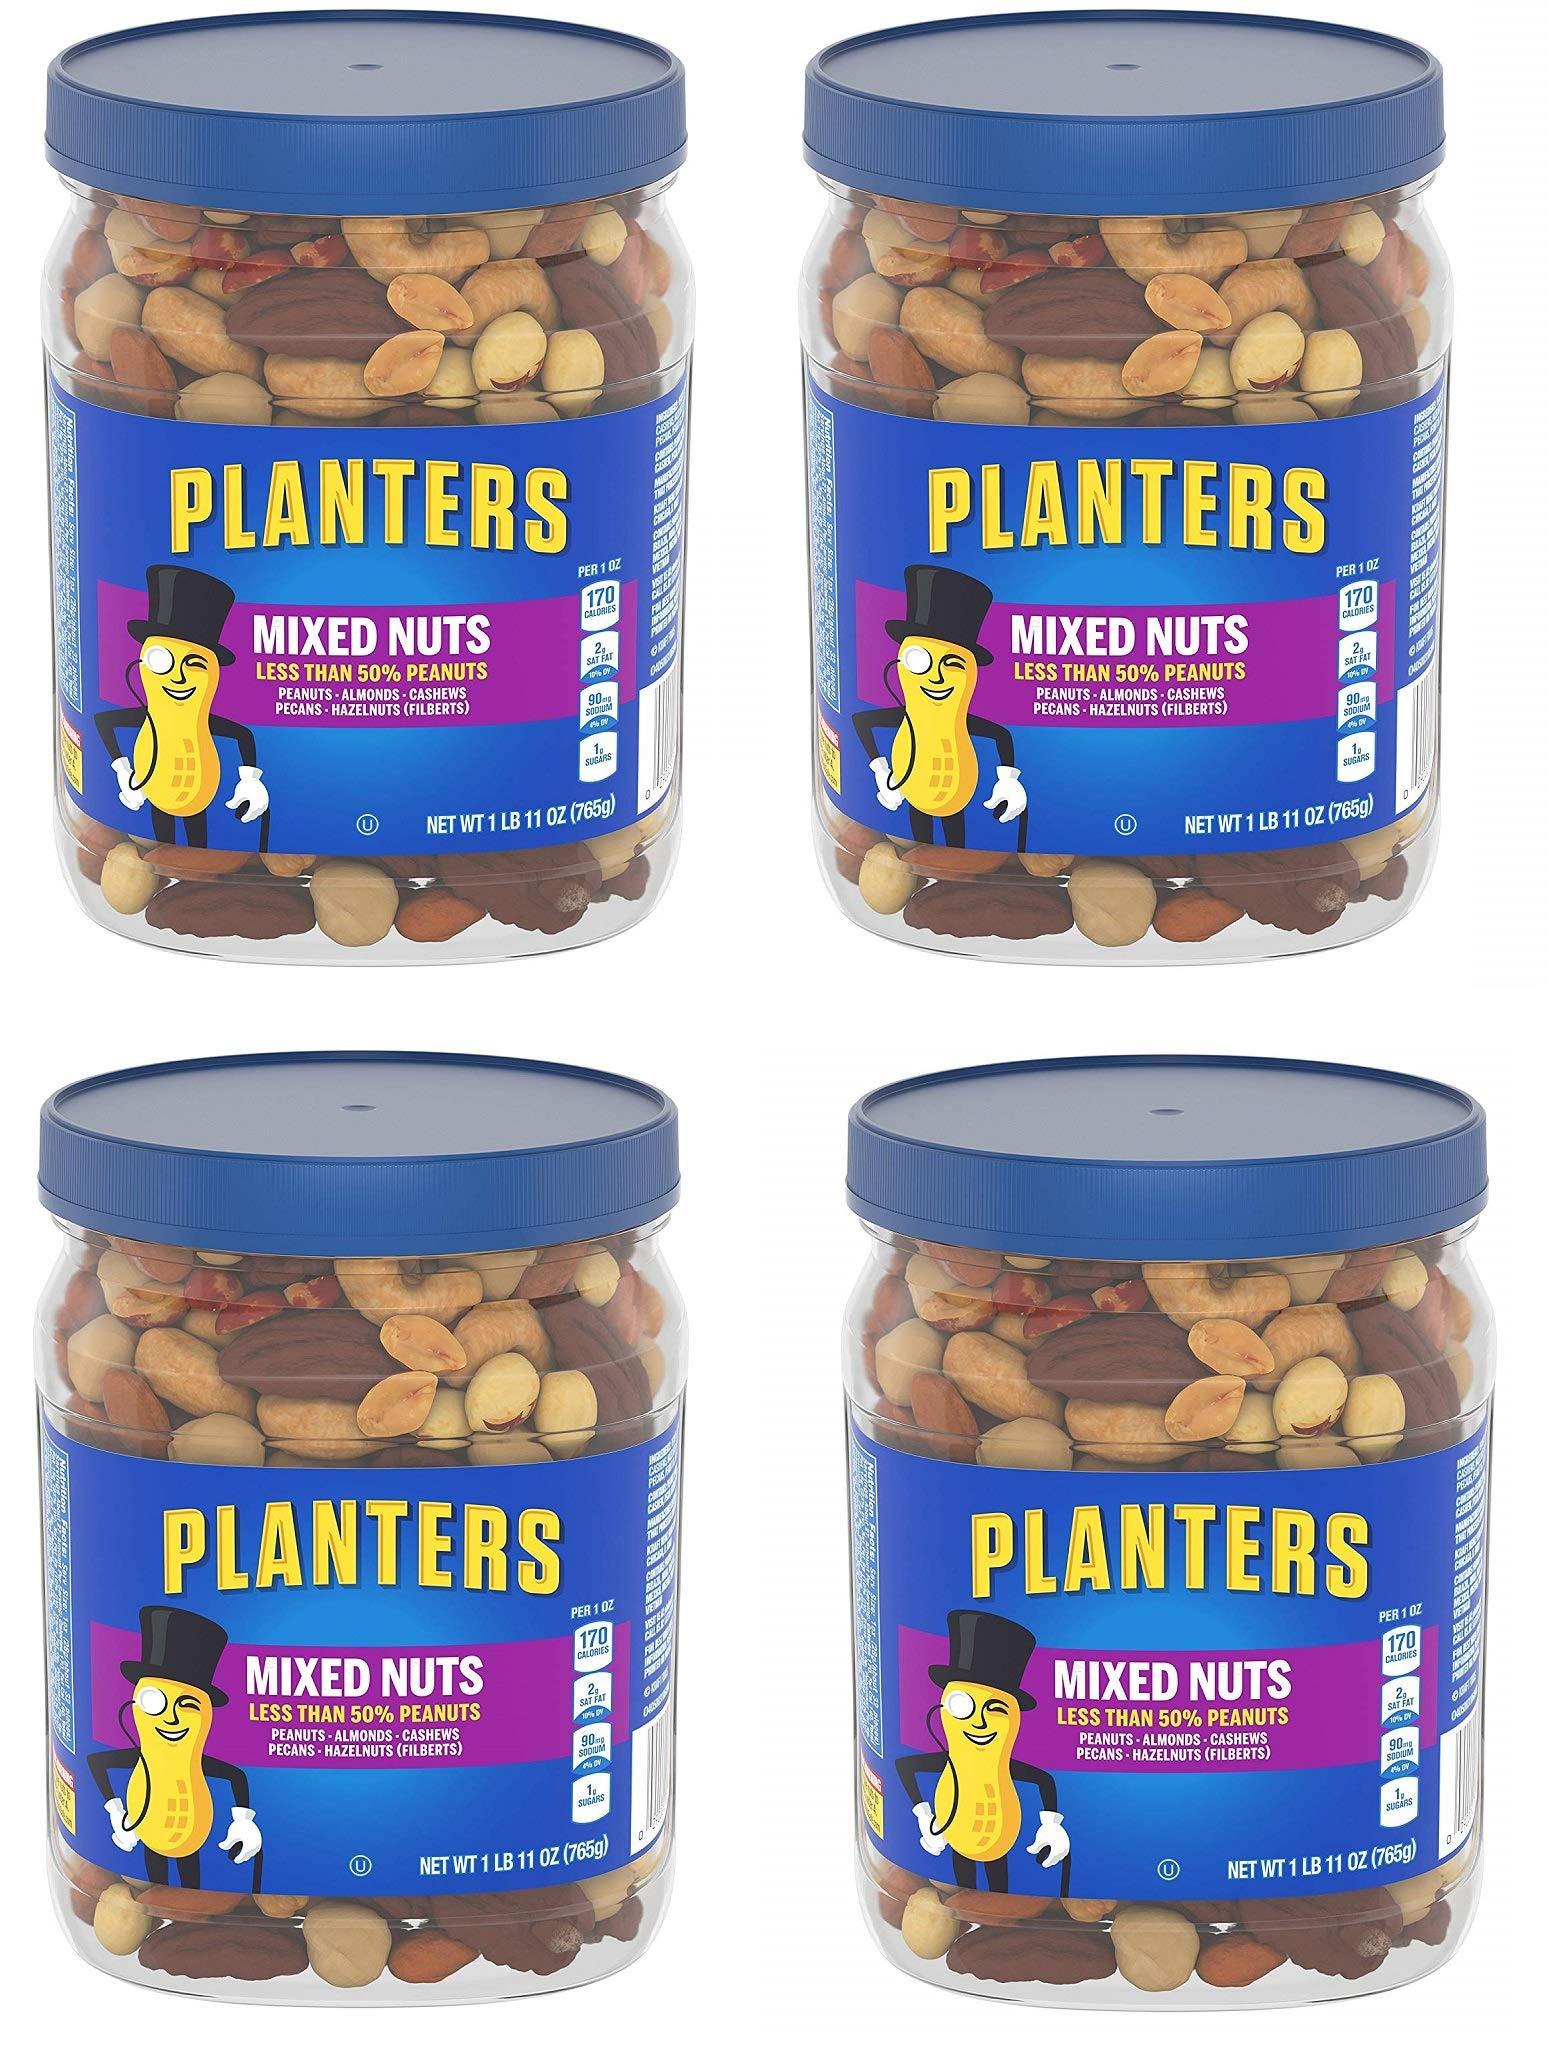 Planters Mixed Nuts, Regular Mixed Nuts, 4 Tubs